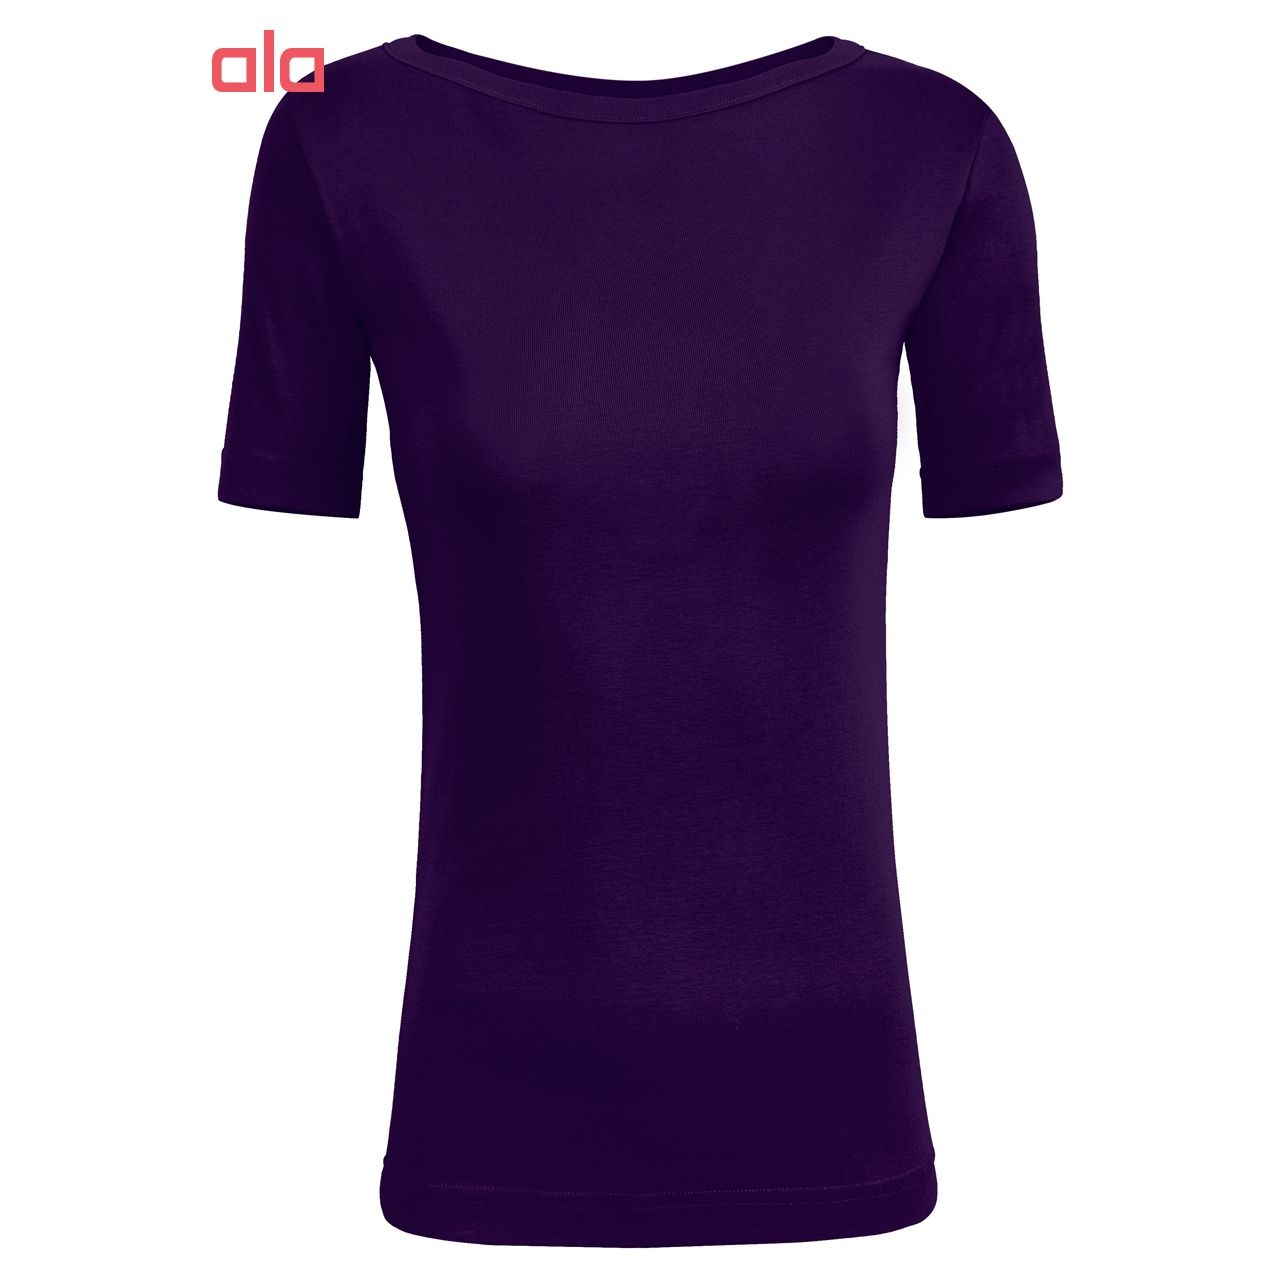 تی شرت نه ساروک مدل TZYGHF02 رنگ بنفش